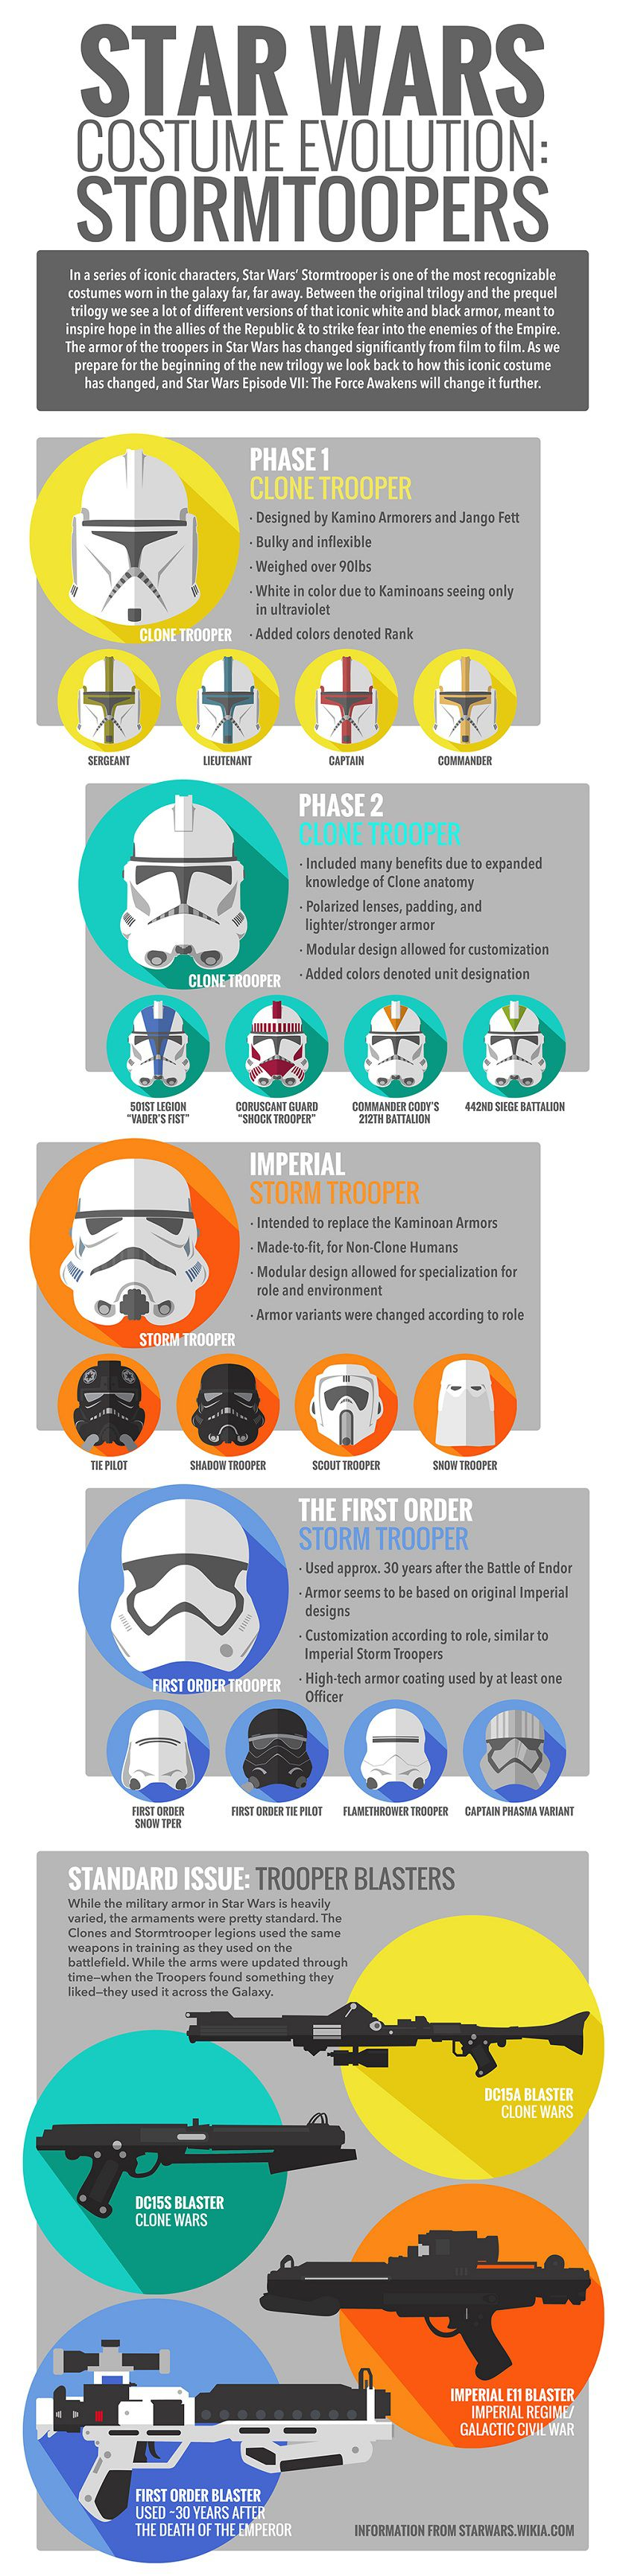 star-wars-costume-evolution-stormtrooper-infographie [840 x 3459]